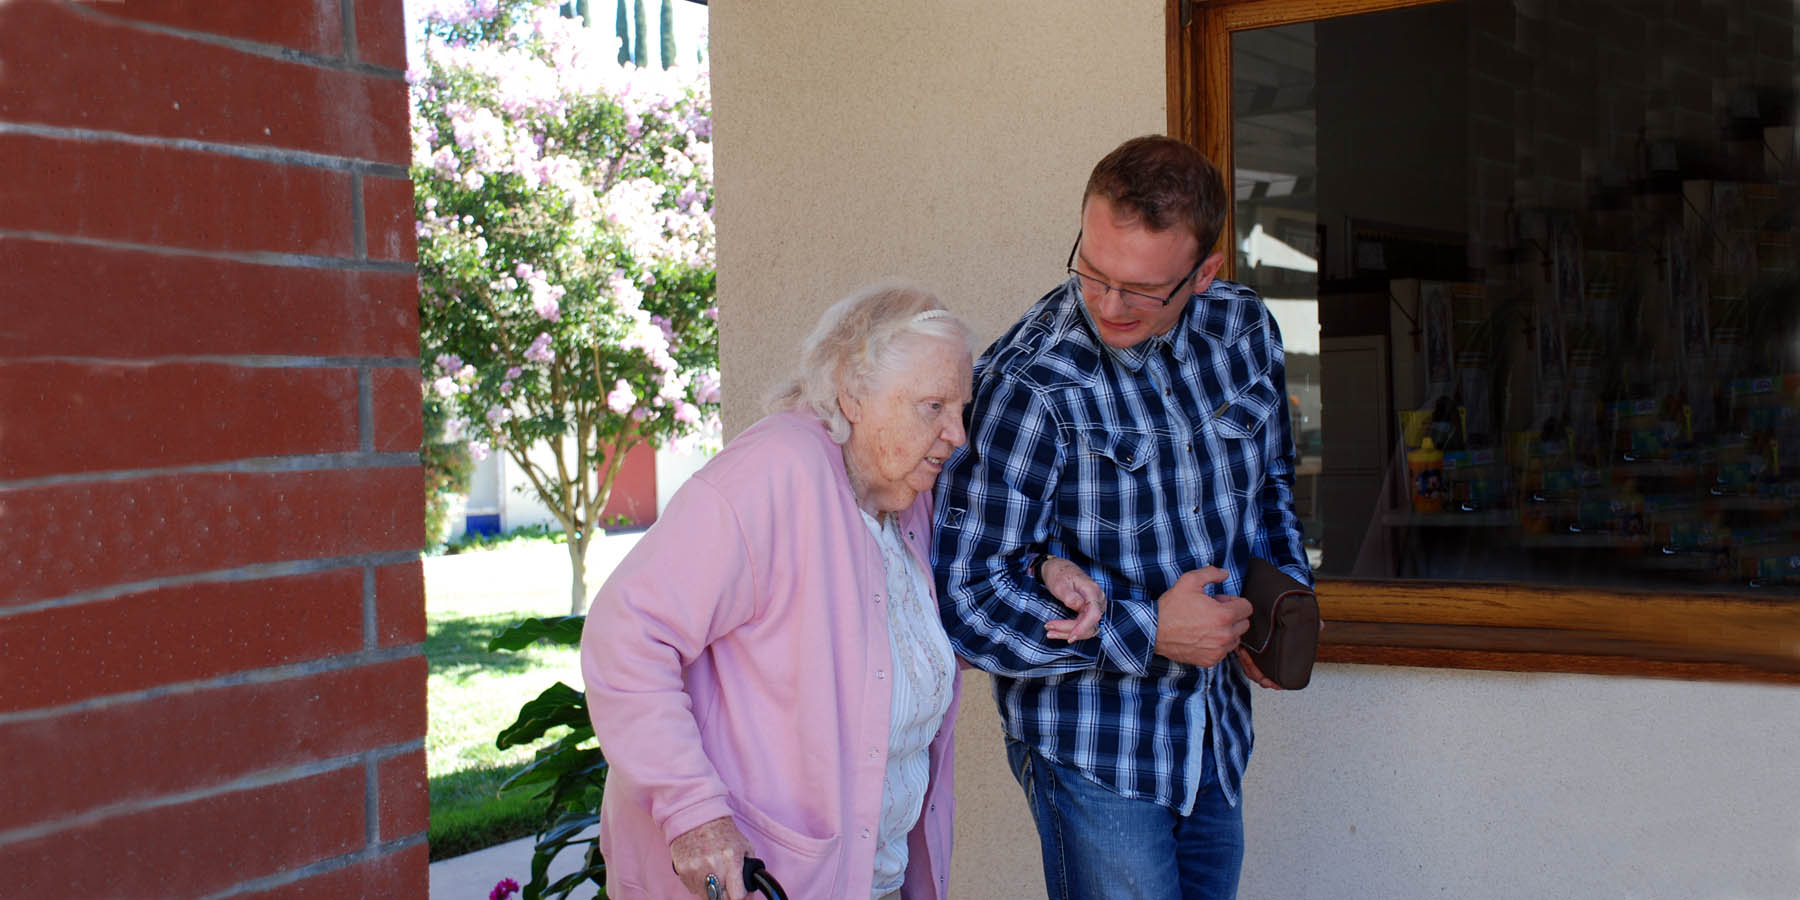 assisting-elderly